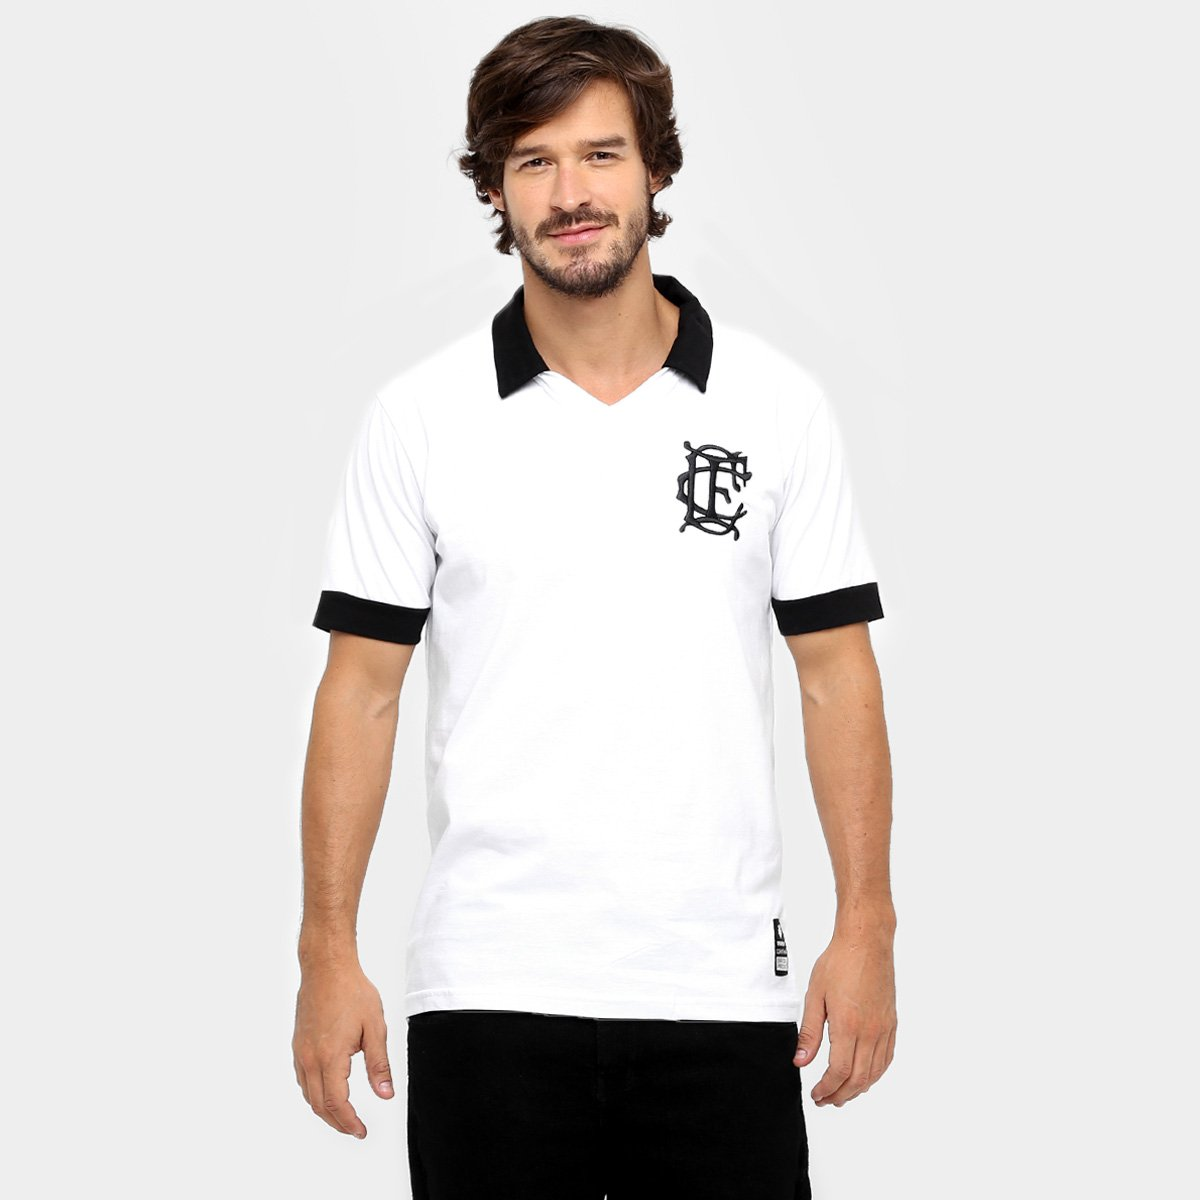 c12db503a7 Camisa Polo Corinthian-Casuals Retrô Masculina - Branco - Compre ...